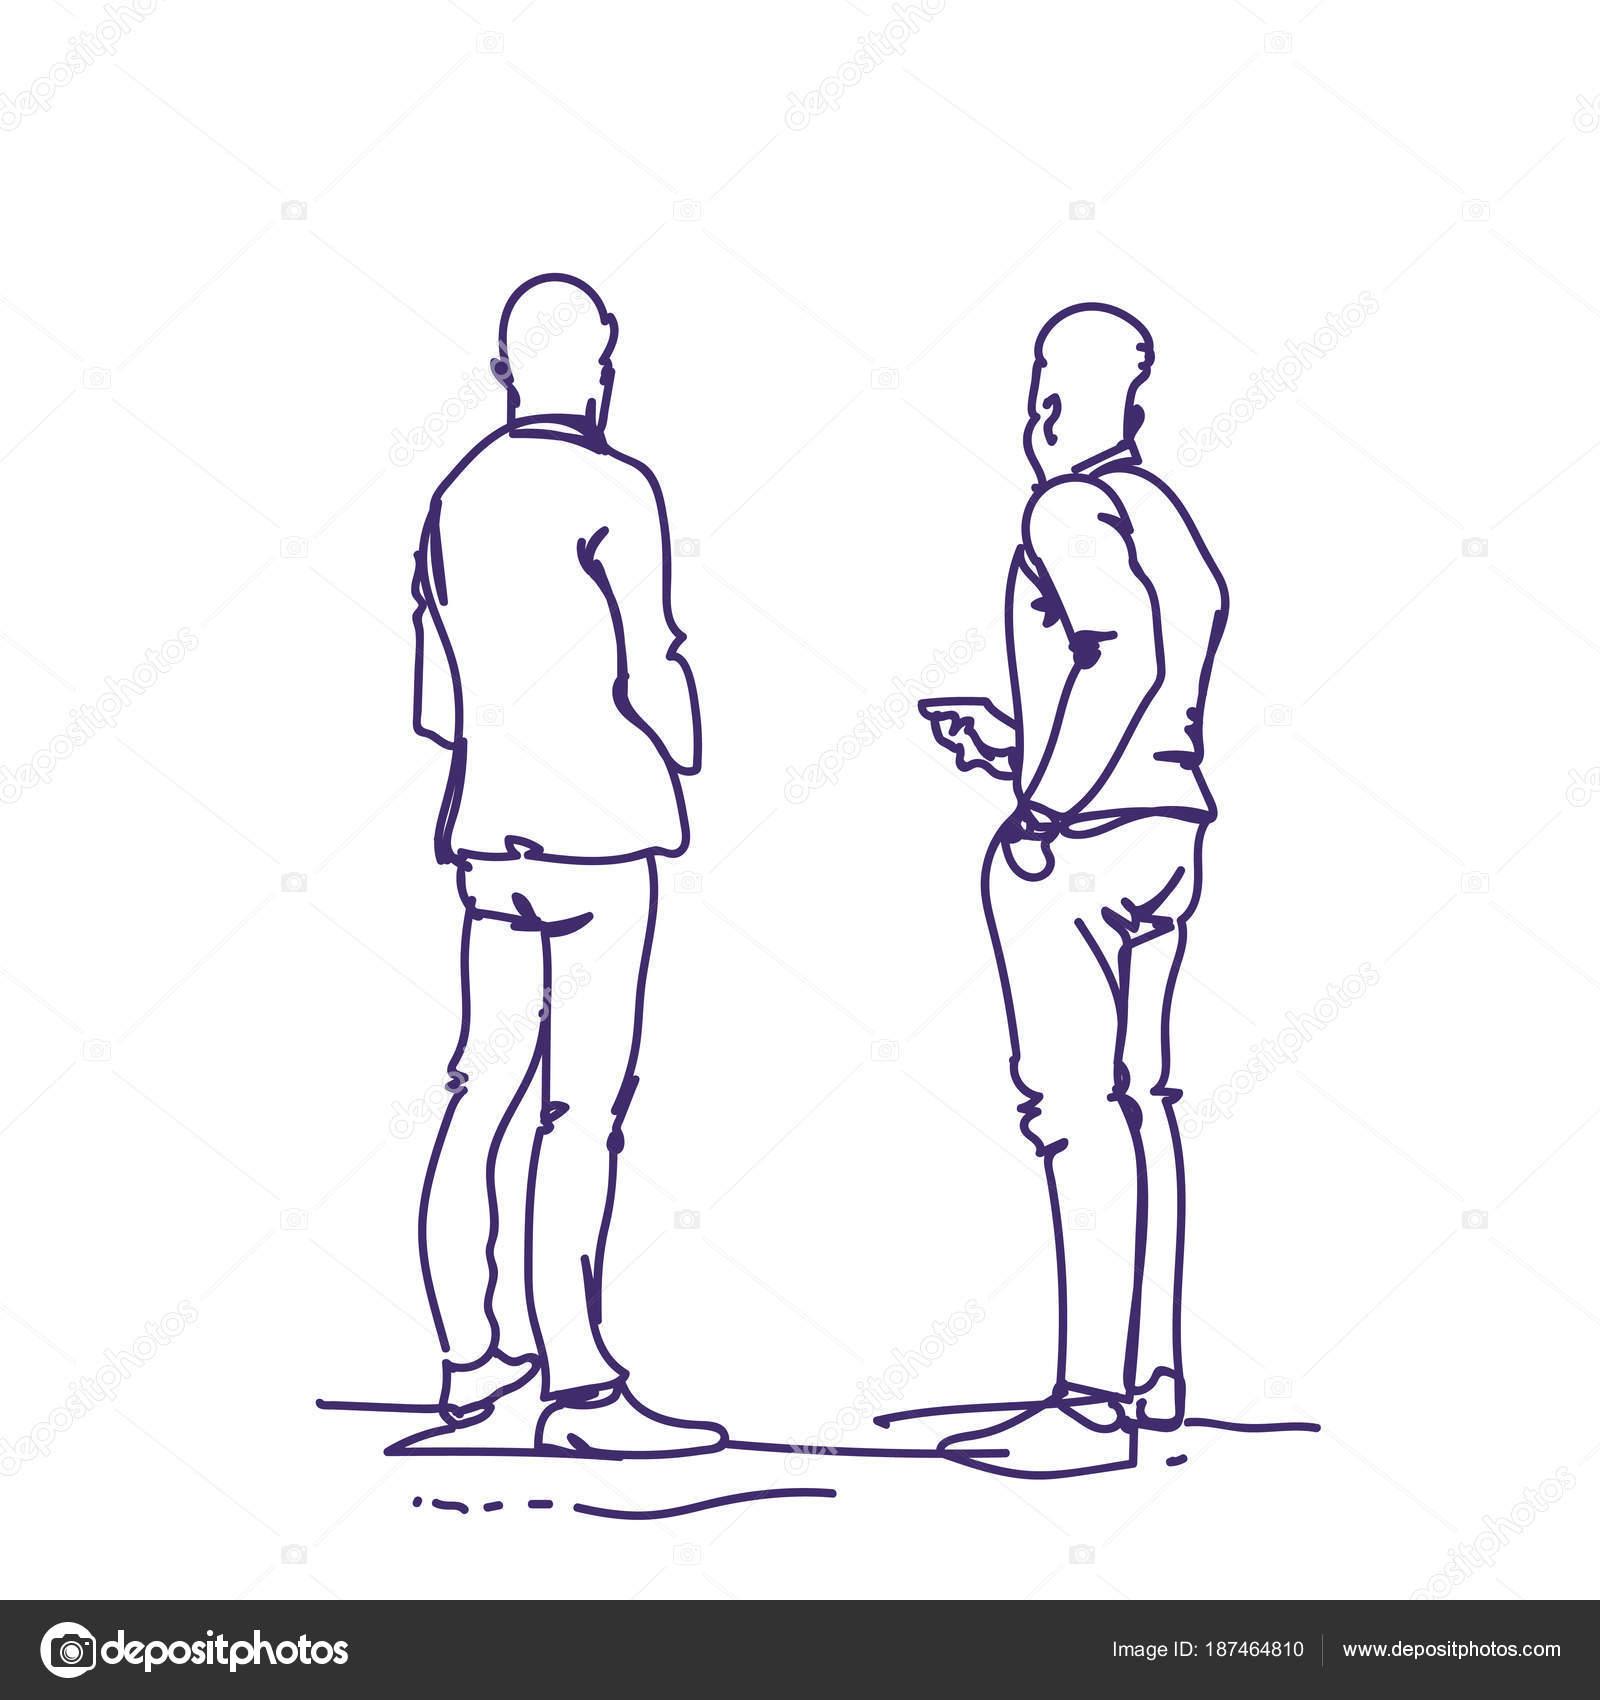 Deux Homme Debout Sketch Dos Gens Holding Smart Phones Parlant